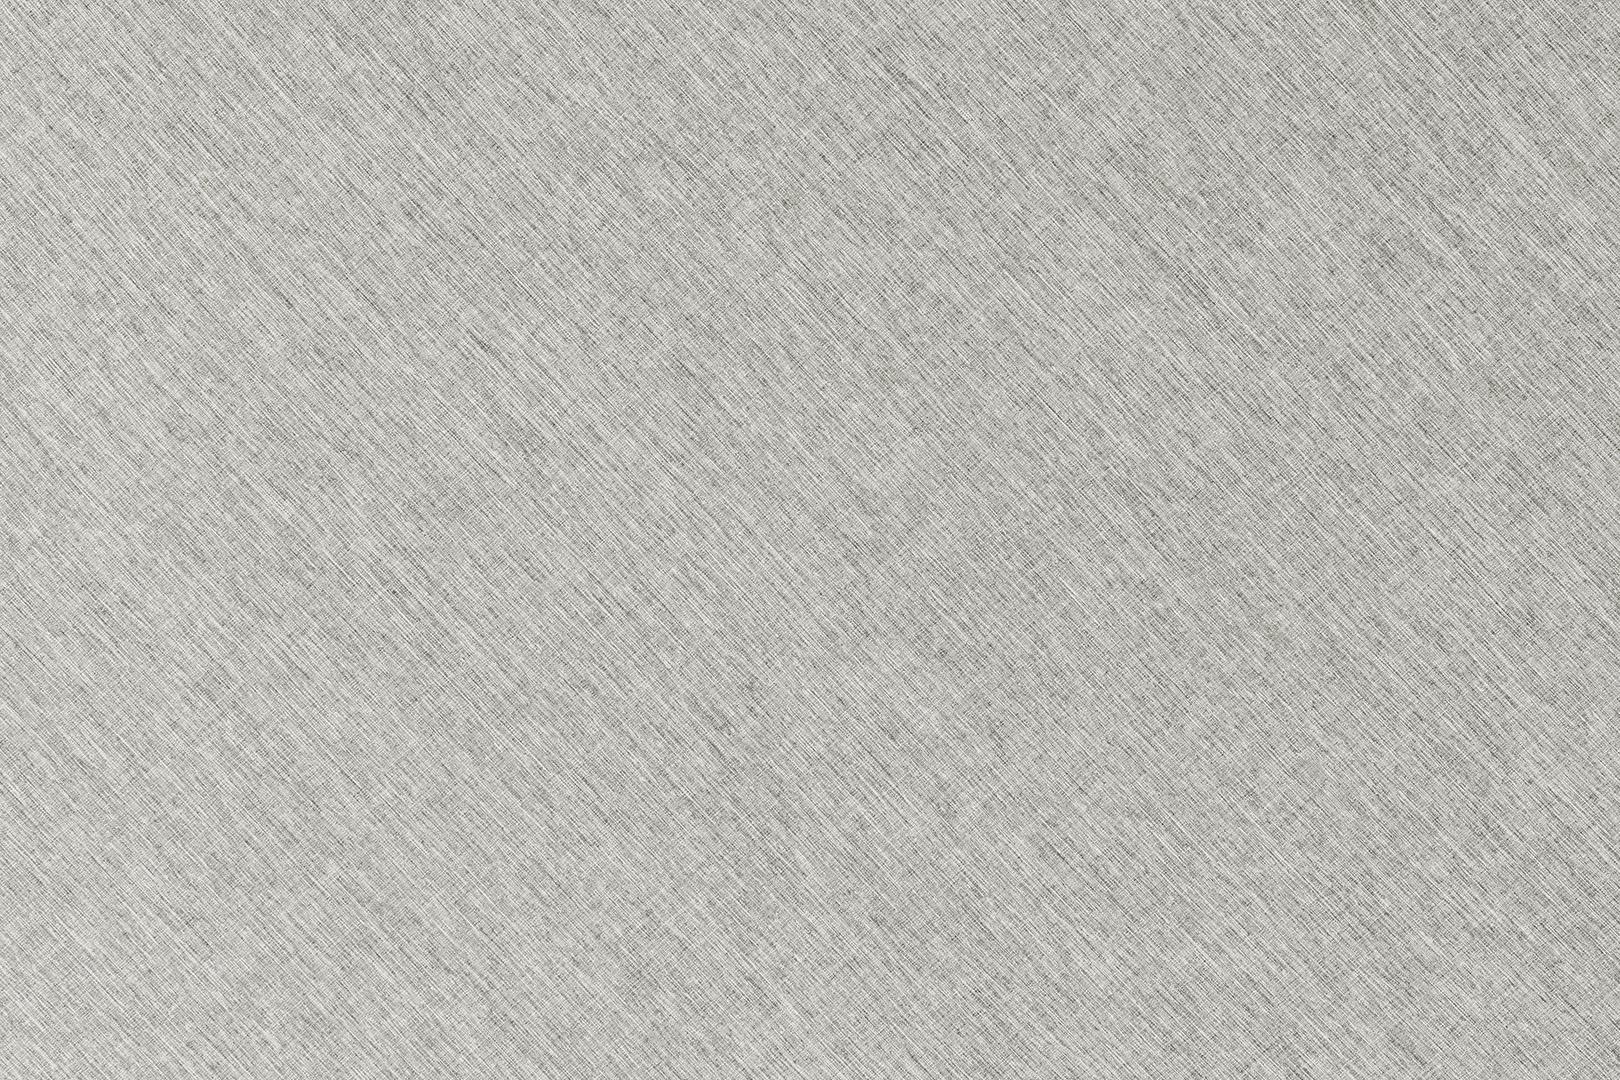 EASY PUSH Schirm, 150 x 210 cm